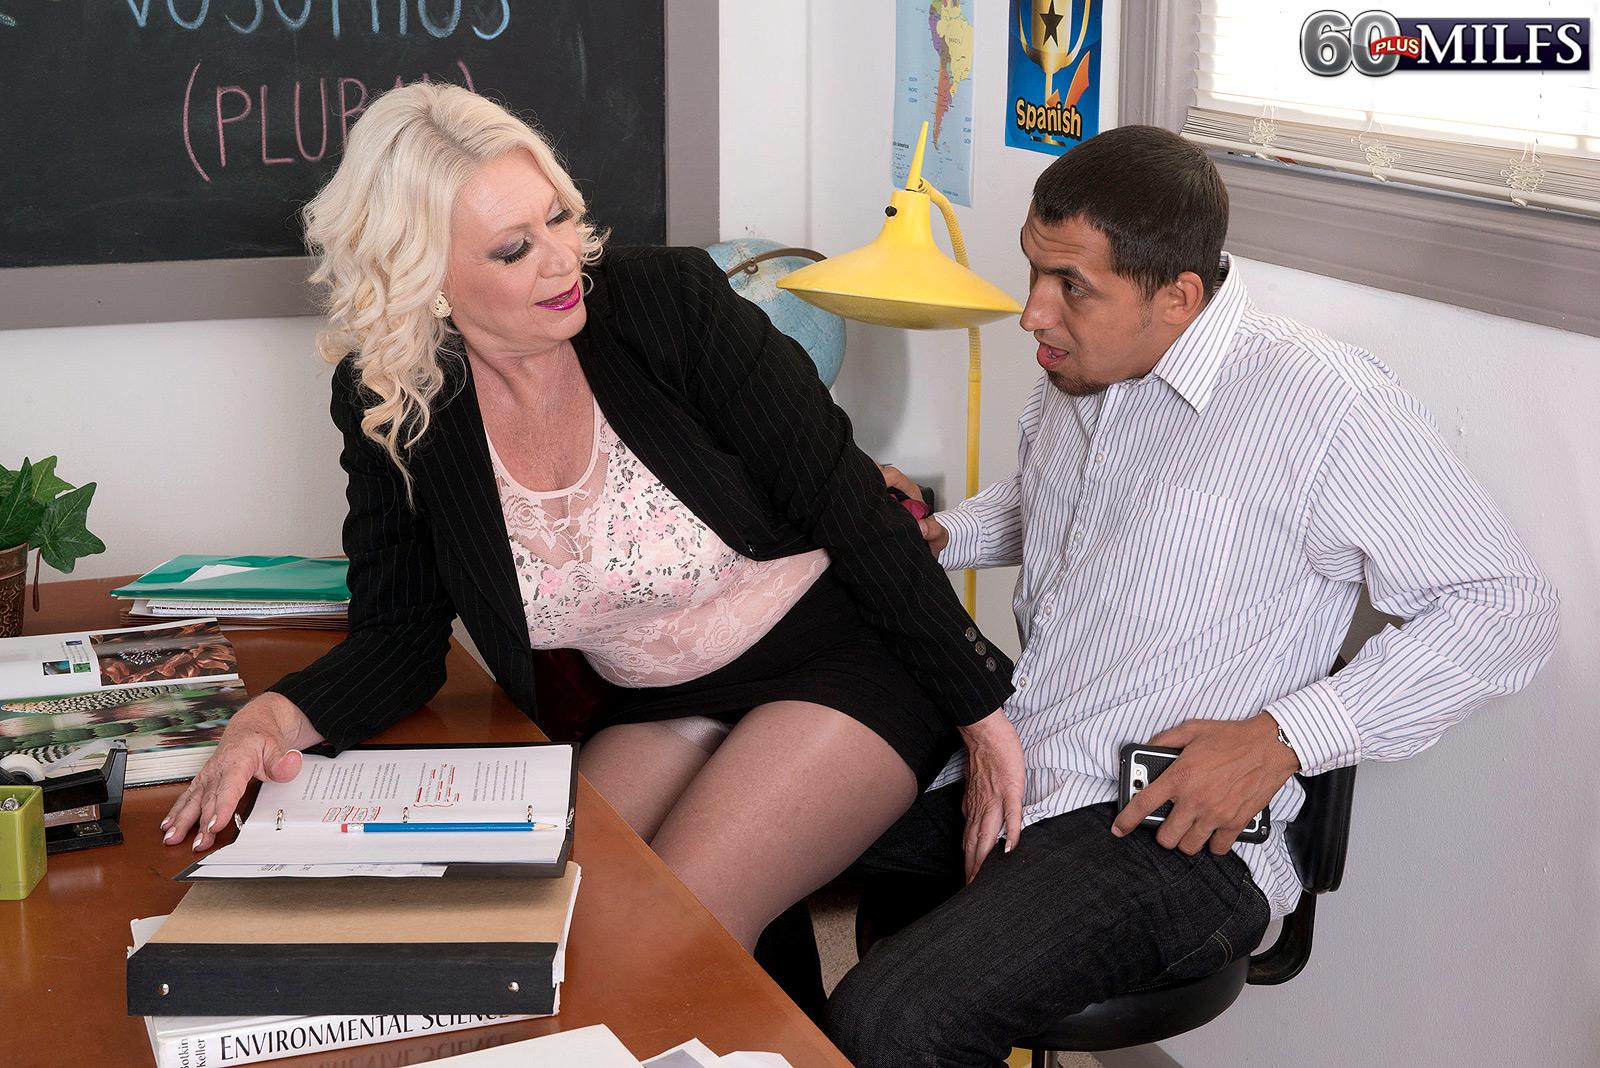 Granny teacher naked milf | XXX photo)